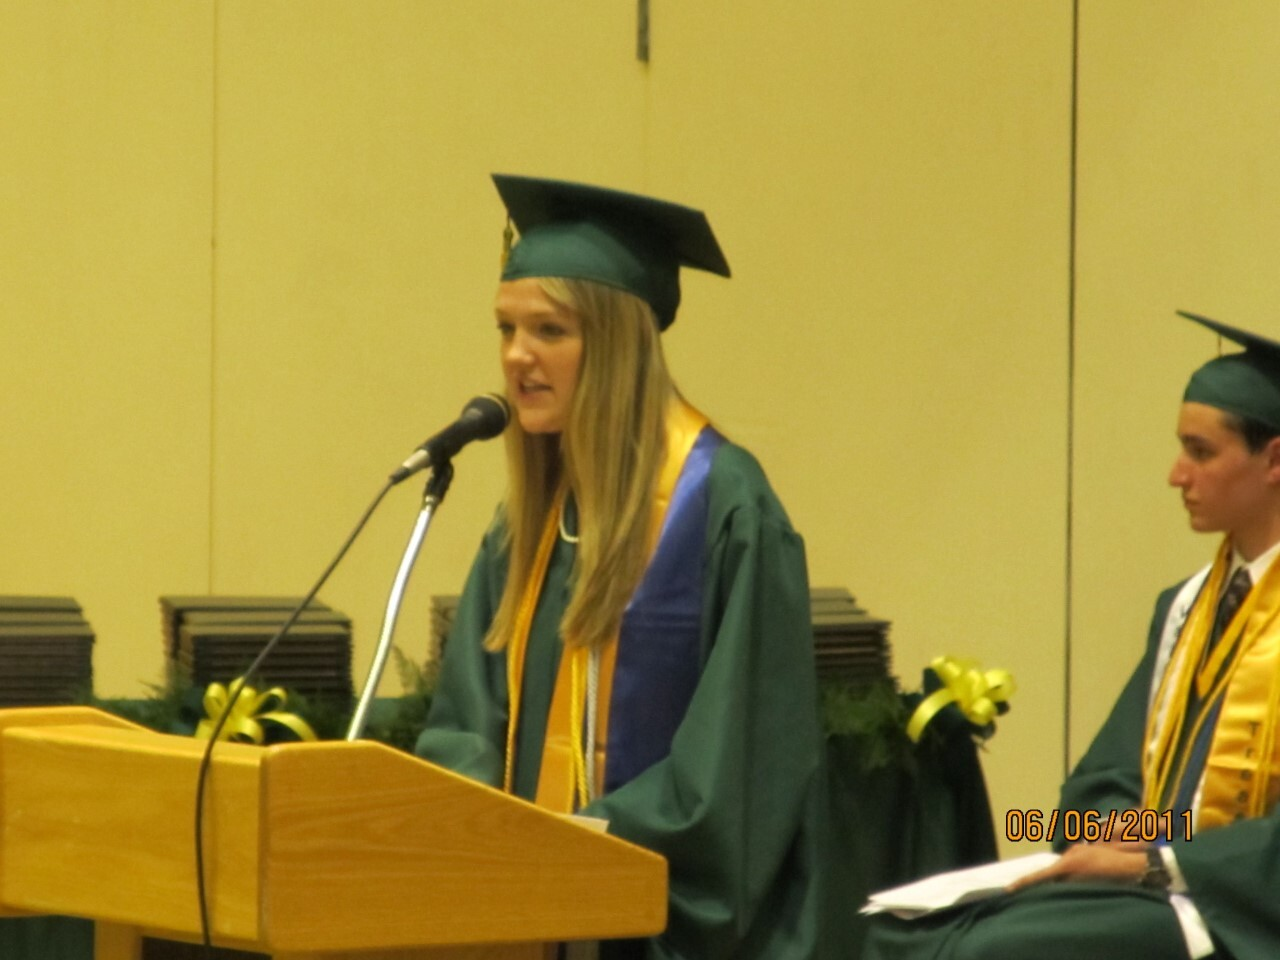 Tessa DiTirro High School Graduation Pic